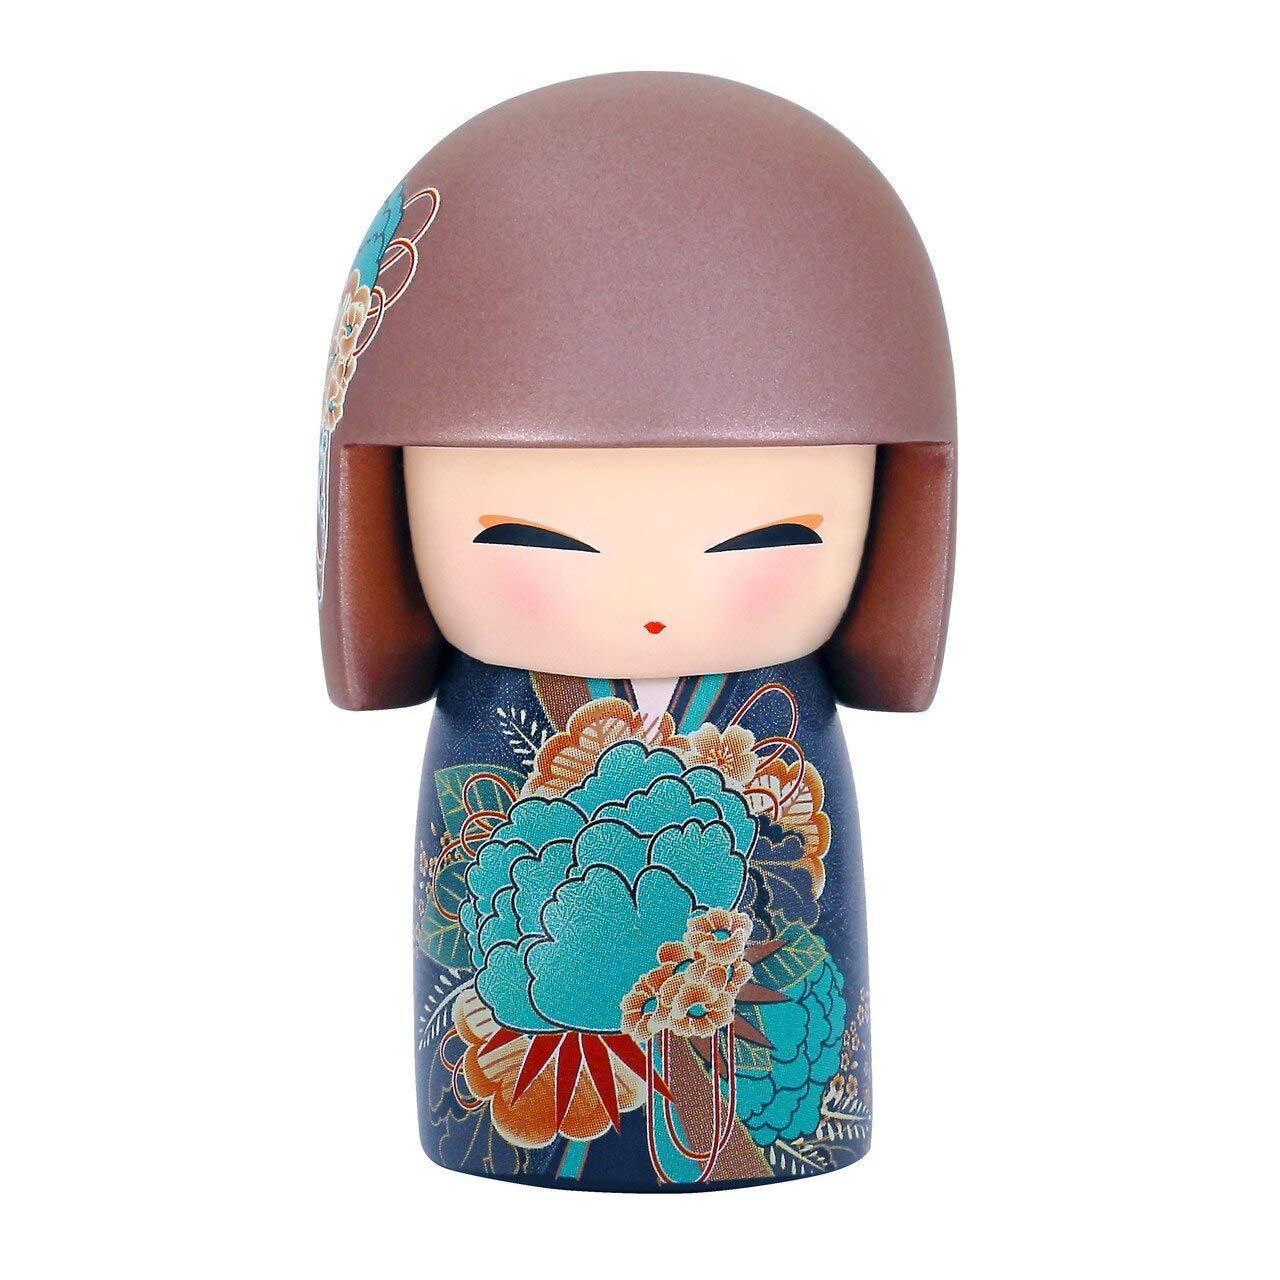 Collezione 2019 6 cm TGKFS137 Kimmidoll Mini Bambola Yumi ?Beauty